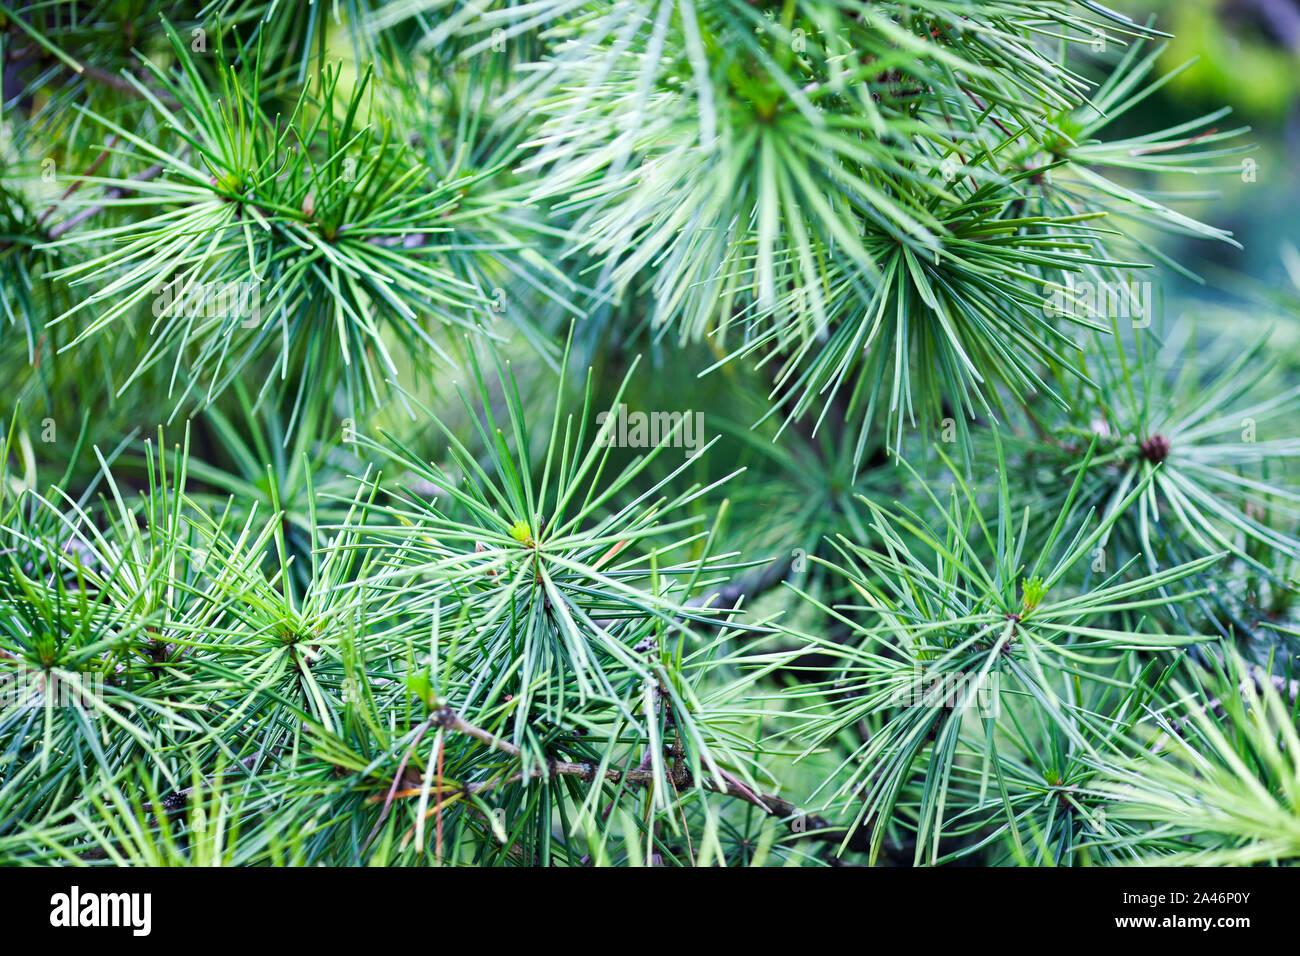 A close-up image of Japanese umbrella pine tree (Sciadopitys verticillata) Stock Photo